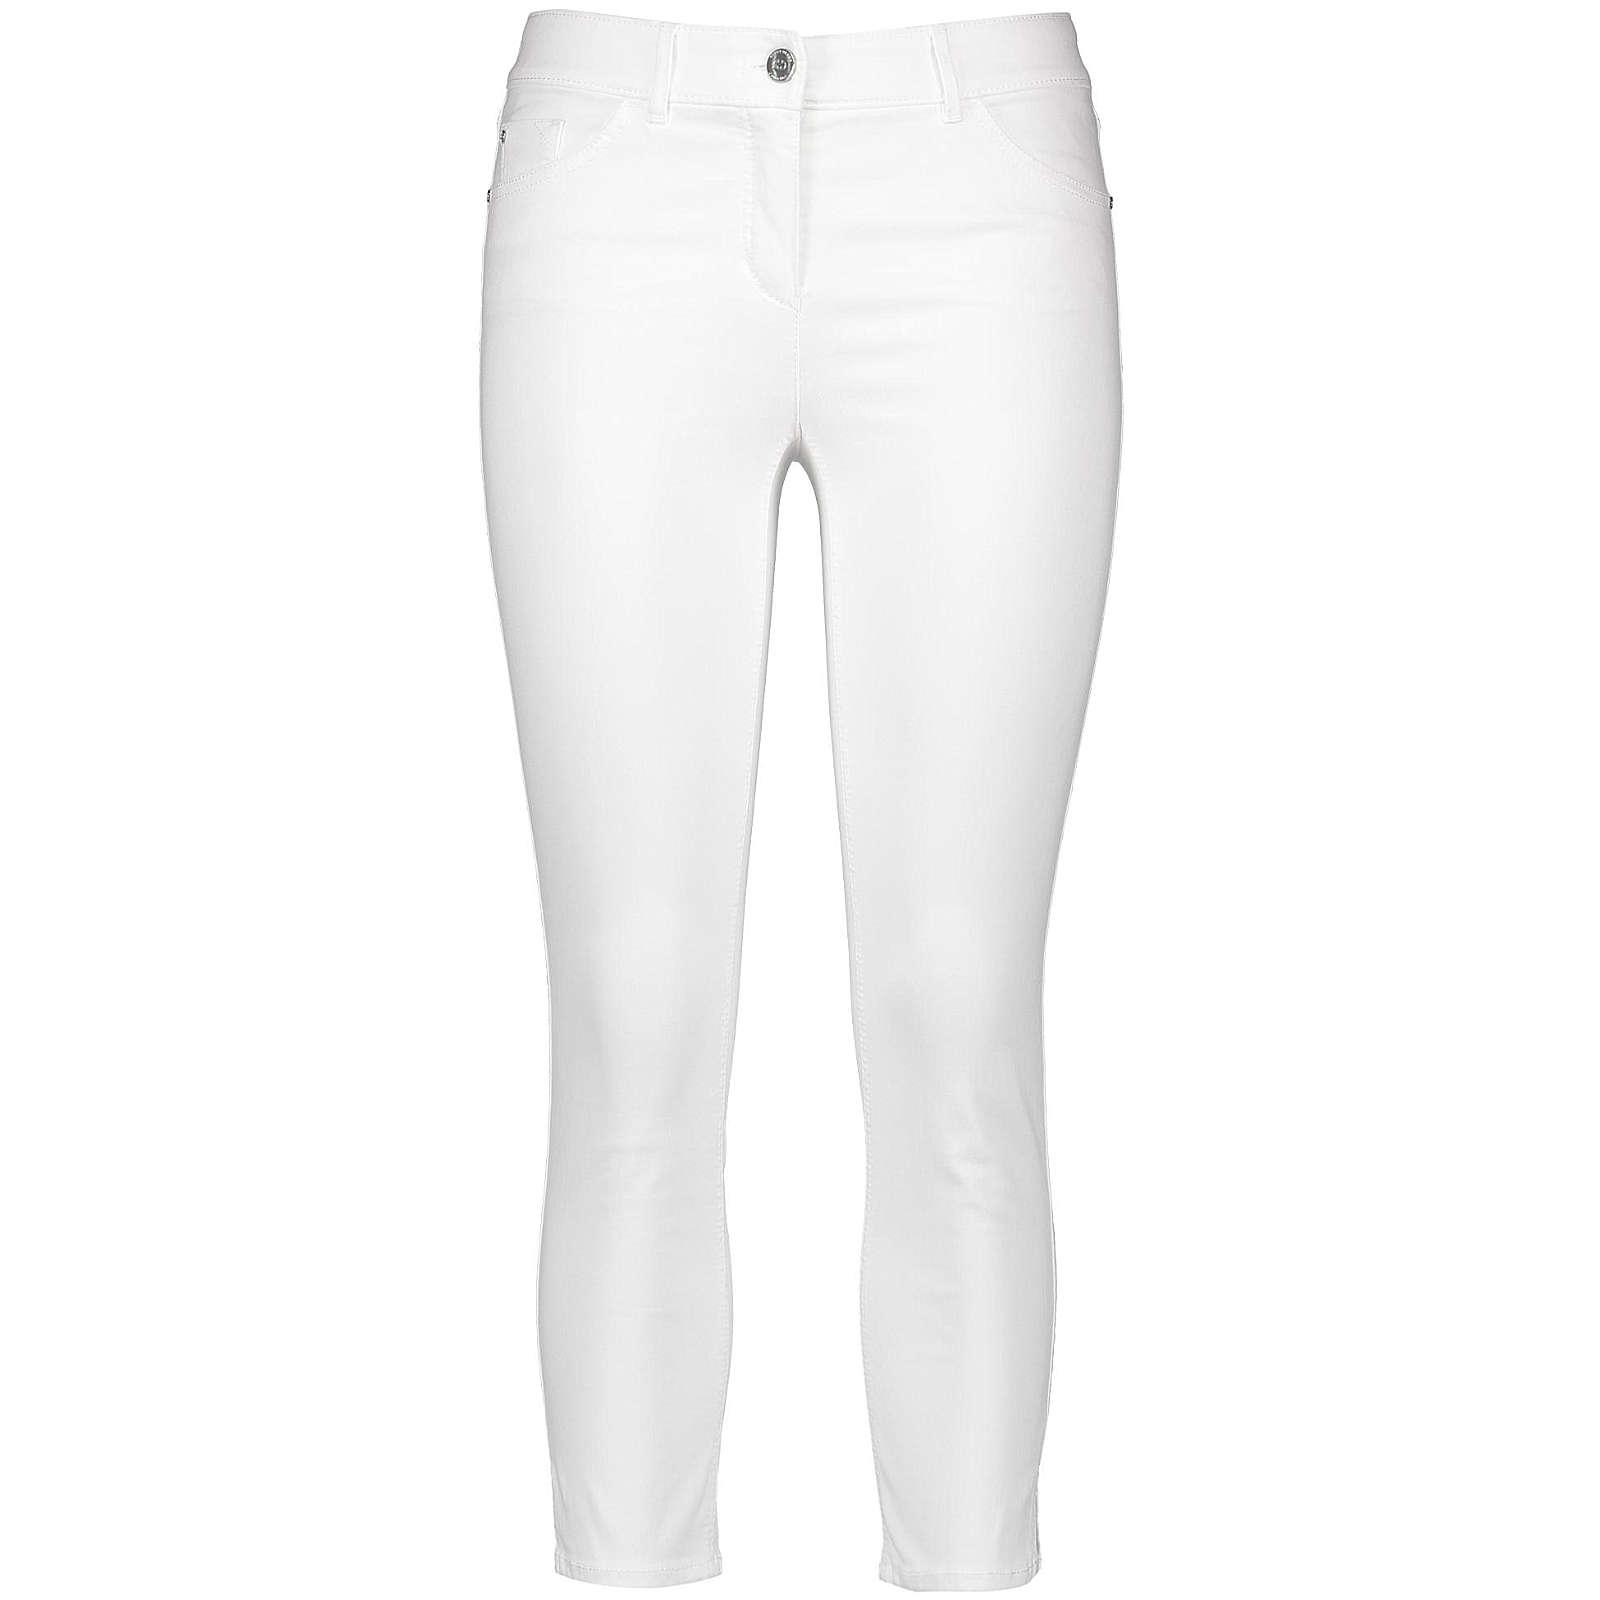 Gerry Weber Hose Jeans verkürzt Verkürzte 5 Pocket Hose offwhite Damen Gr. 38